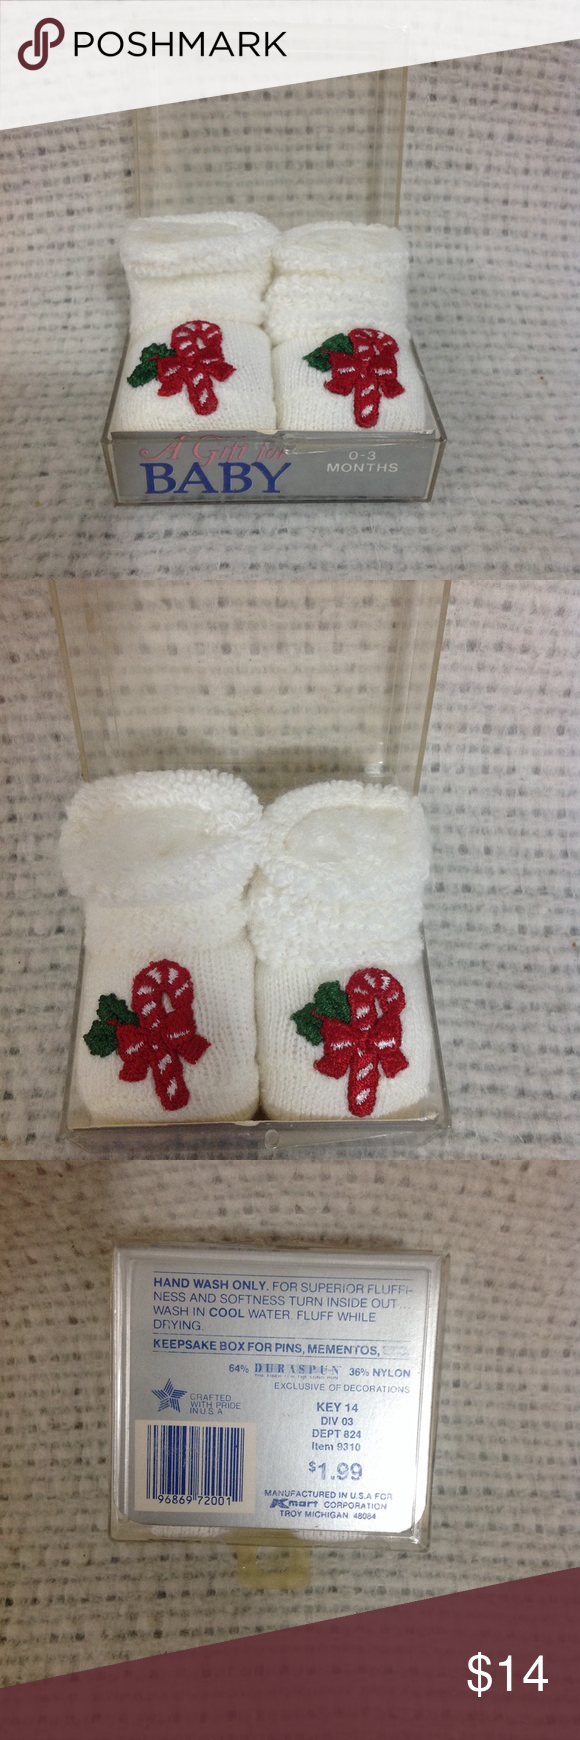 Vintage Kmart Christmas Baby Booties NWT | My Posh Picks | Pinterest ...